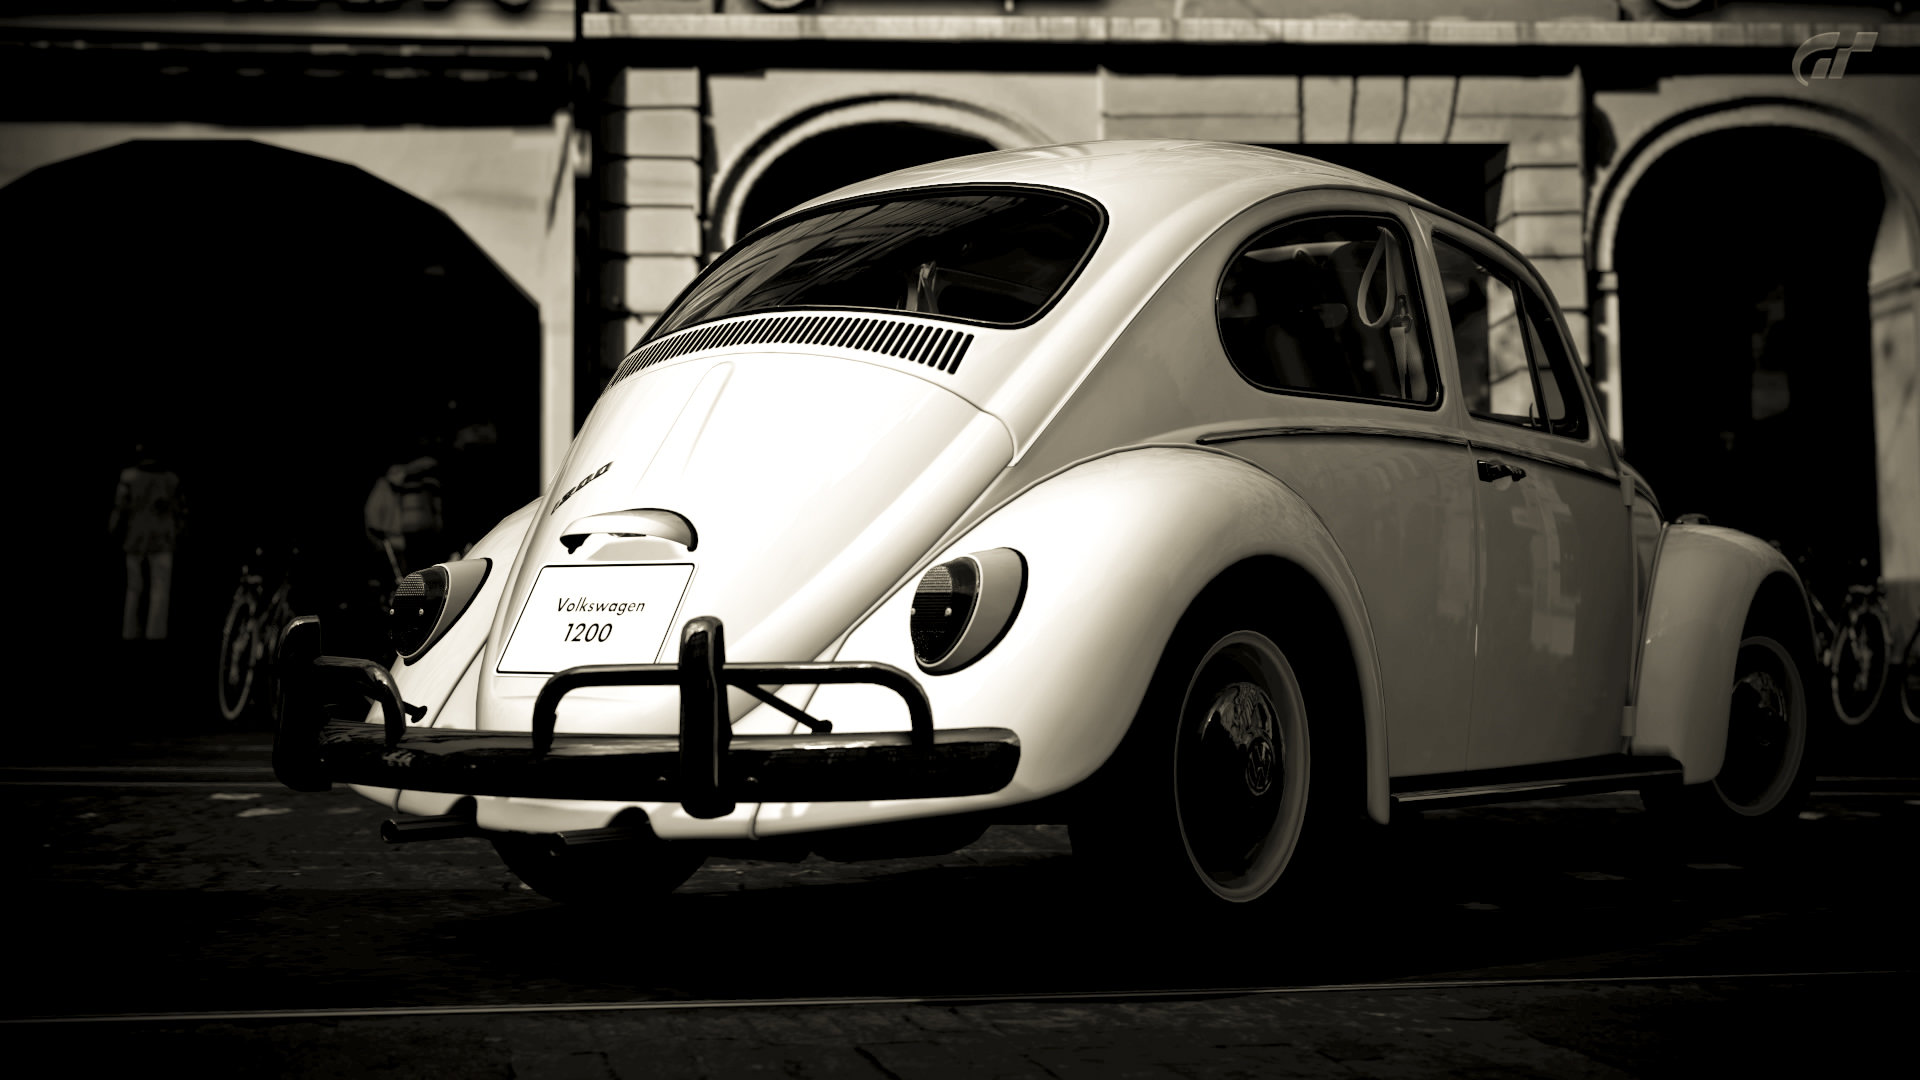 Obrázky z DLC pro Gran Turismo 5 58962